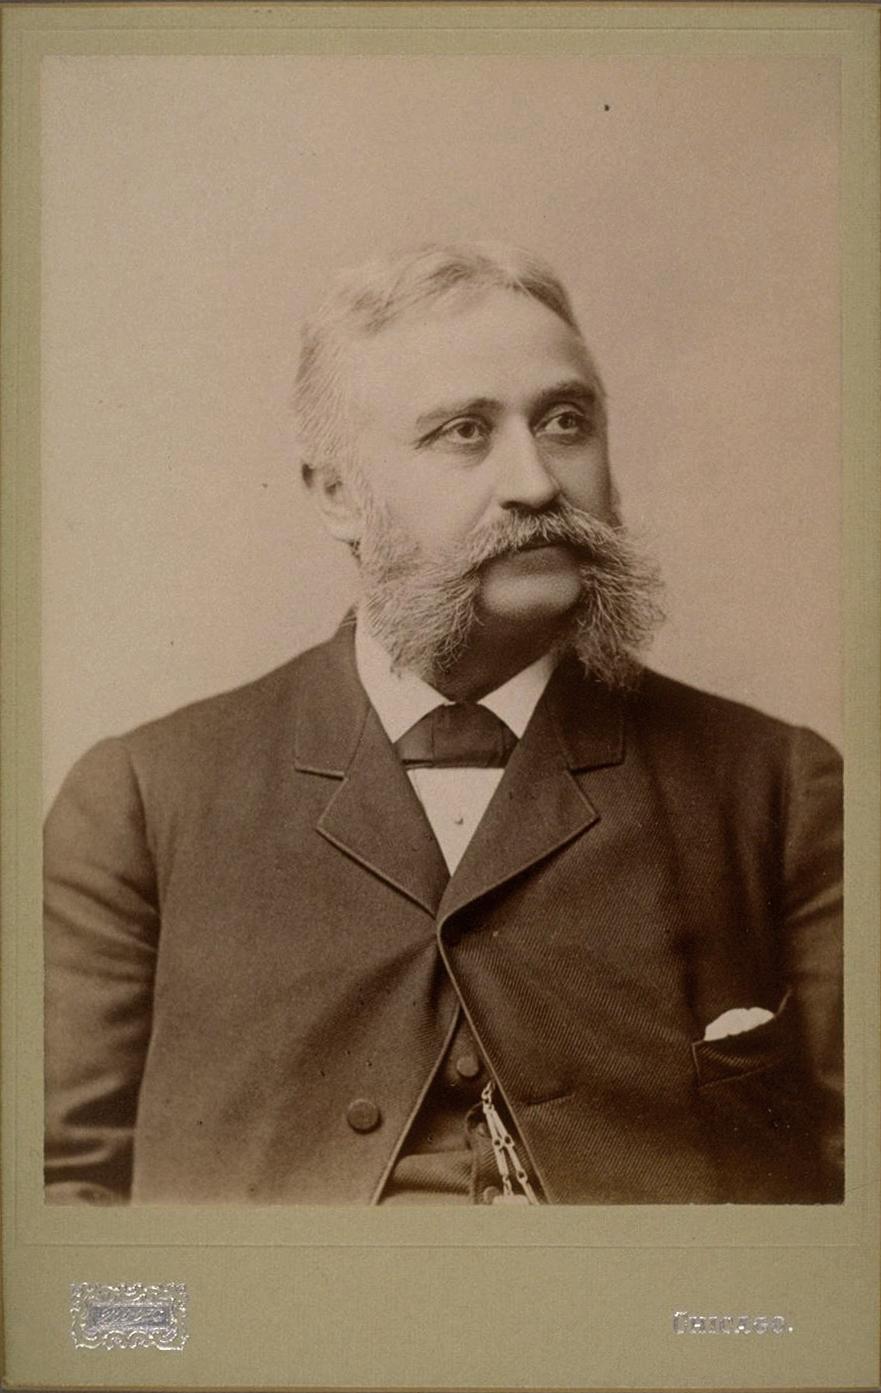 Portrait of Hubert Howe Bancroft